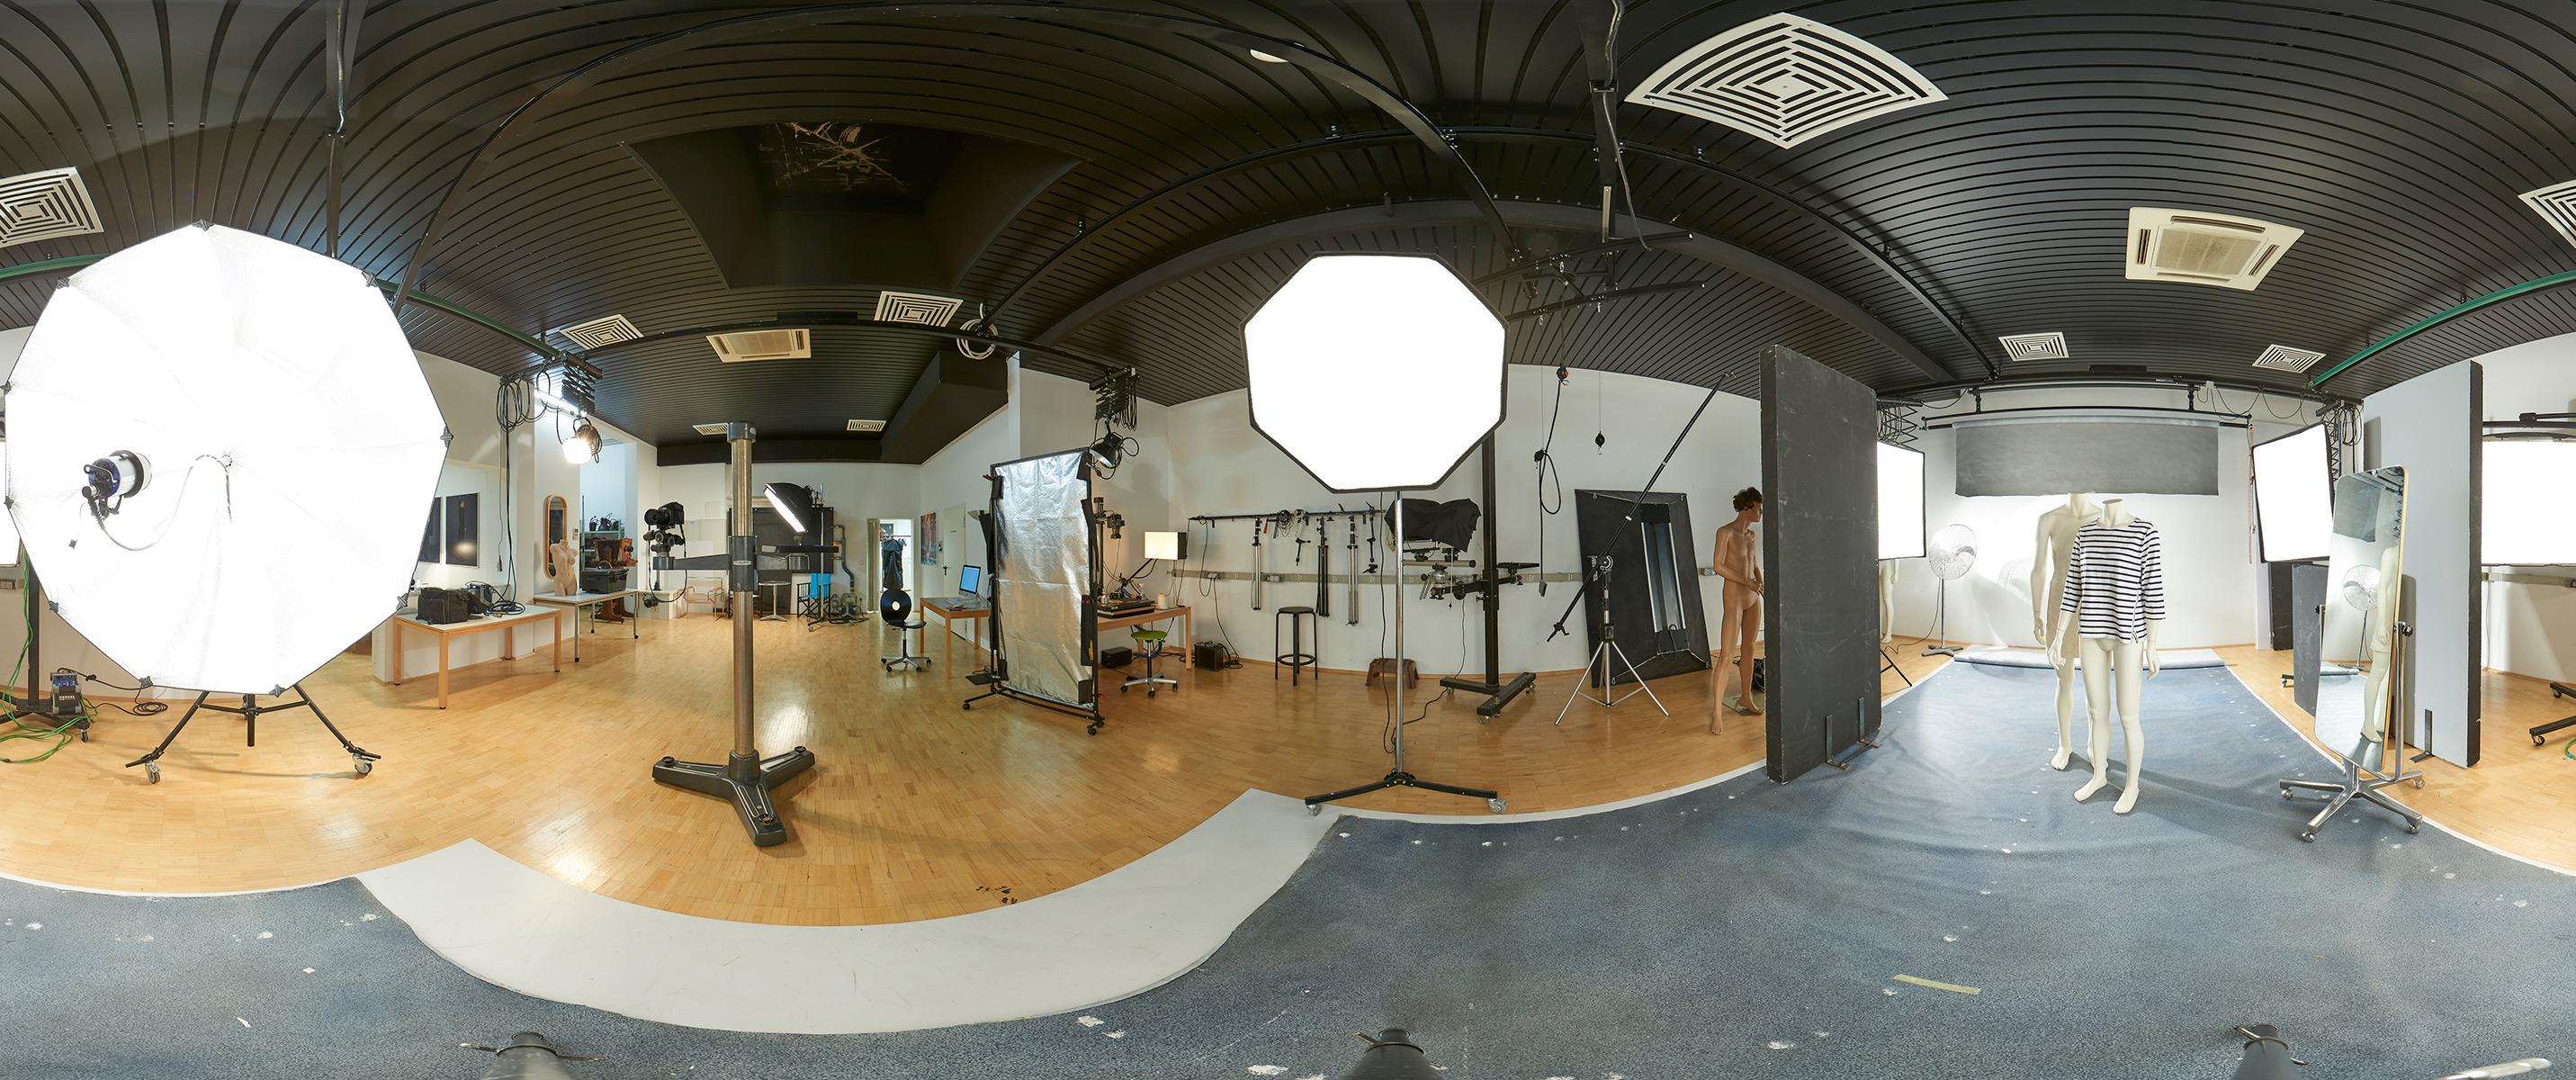 fotostudio inhouse portraitfotografie 360 grad-aufnahme